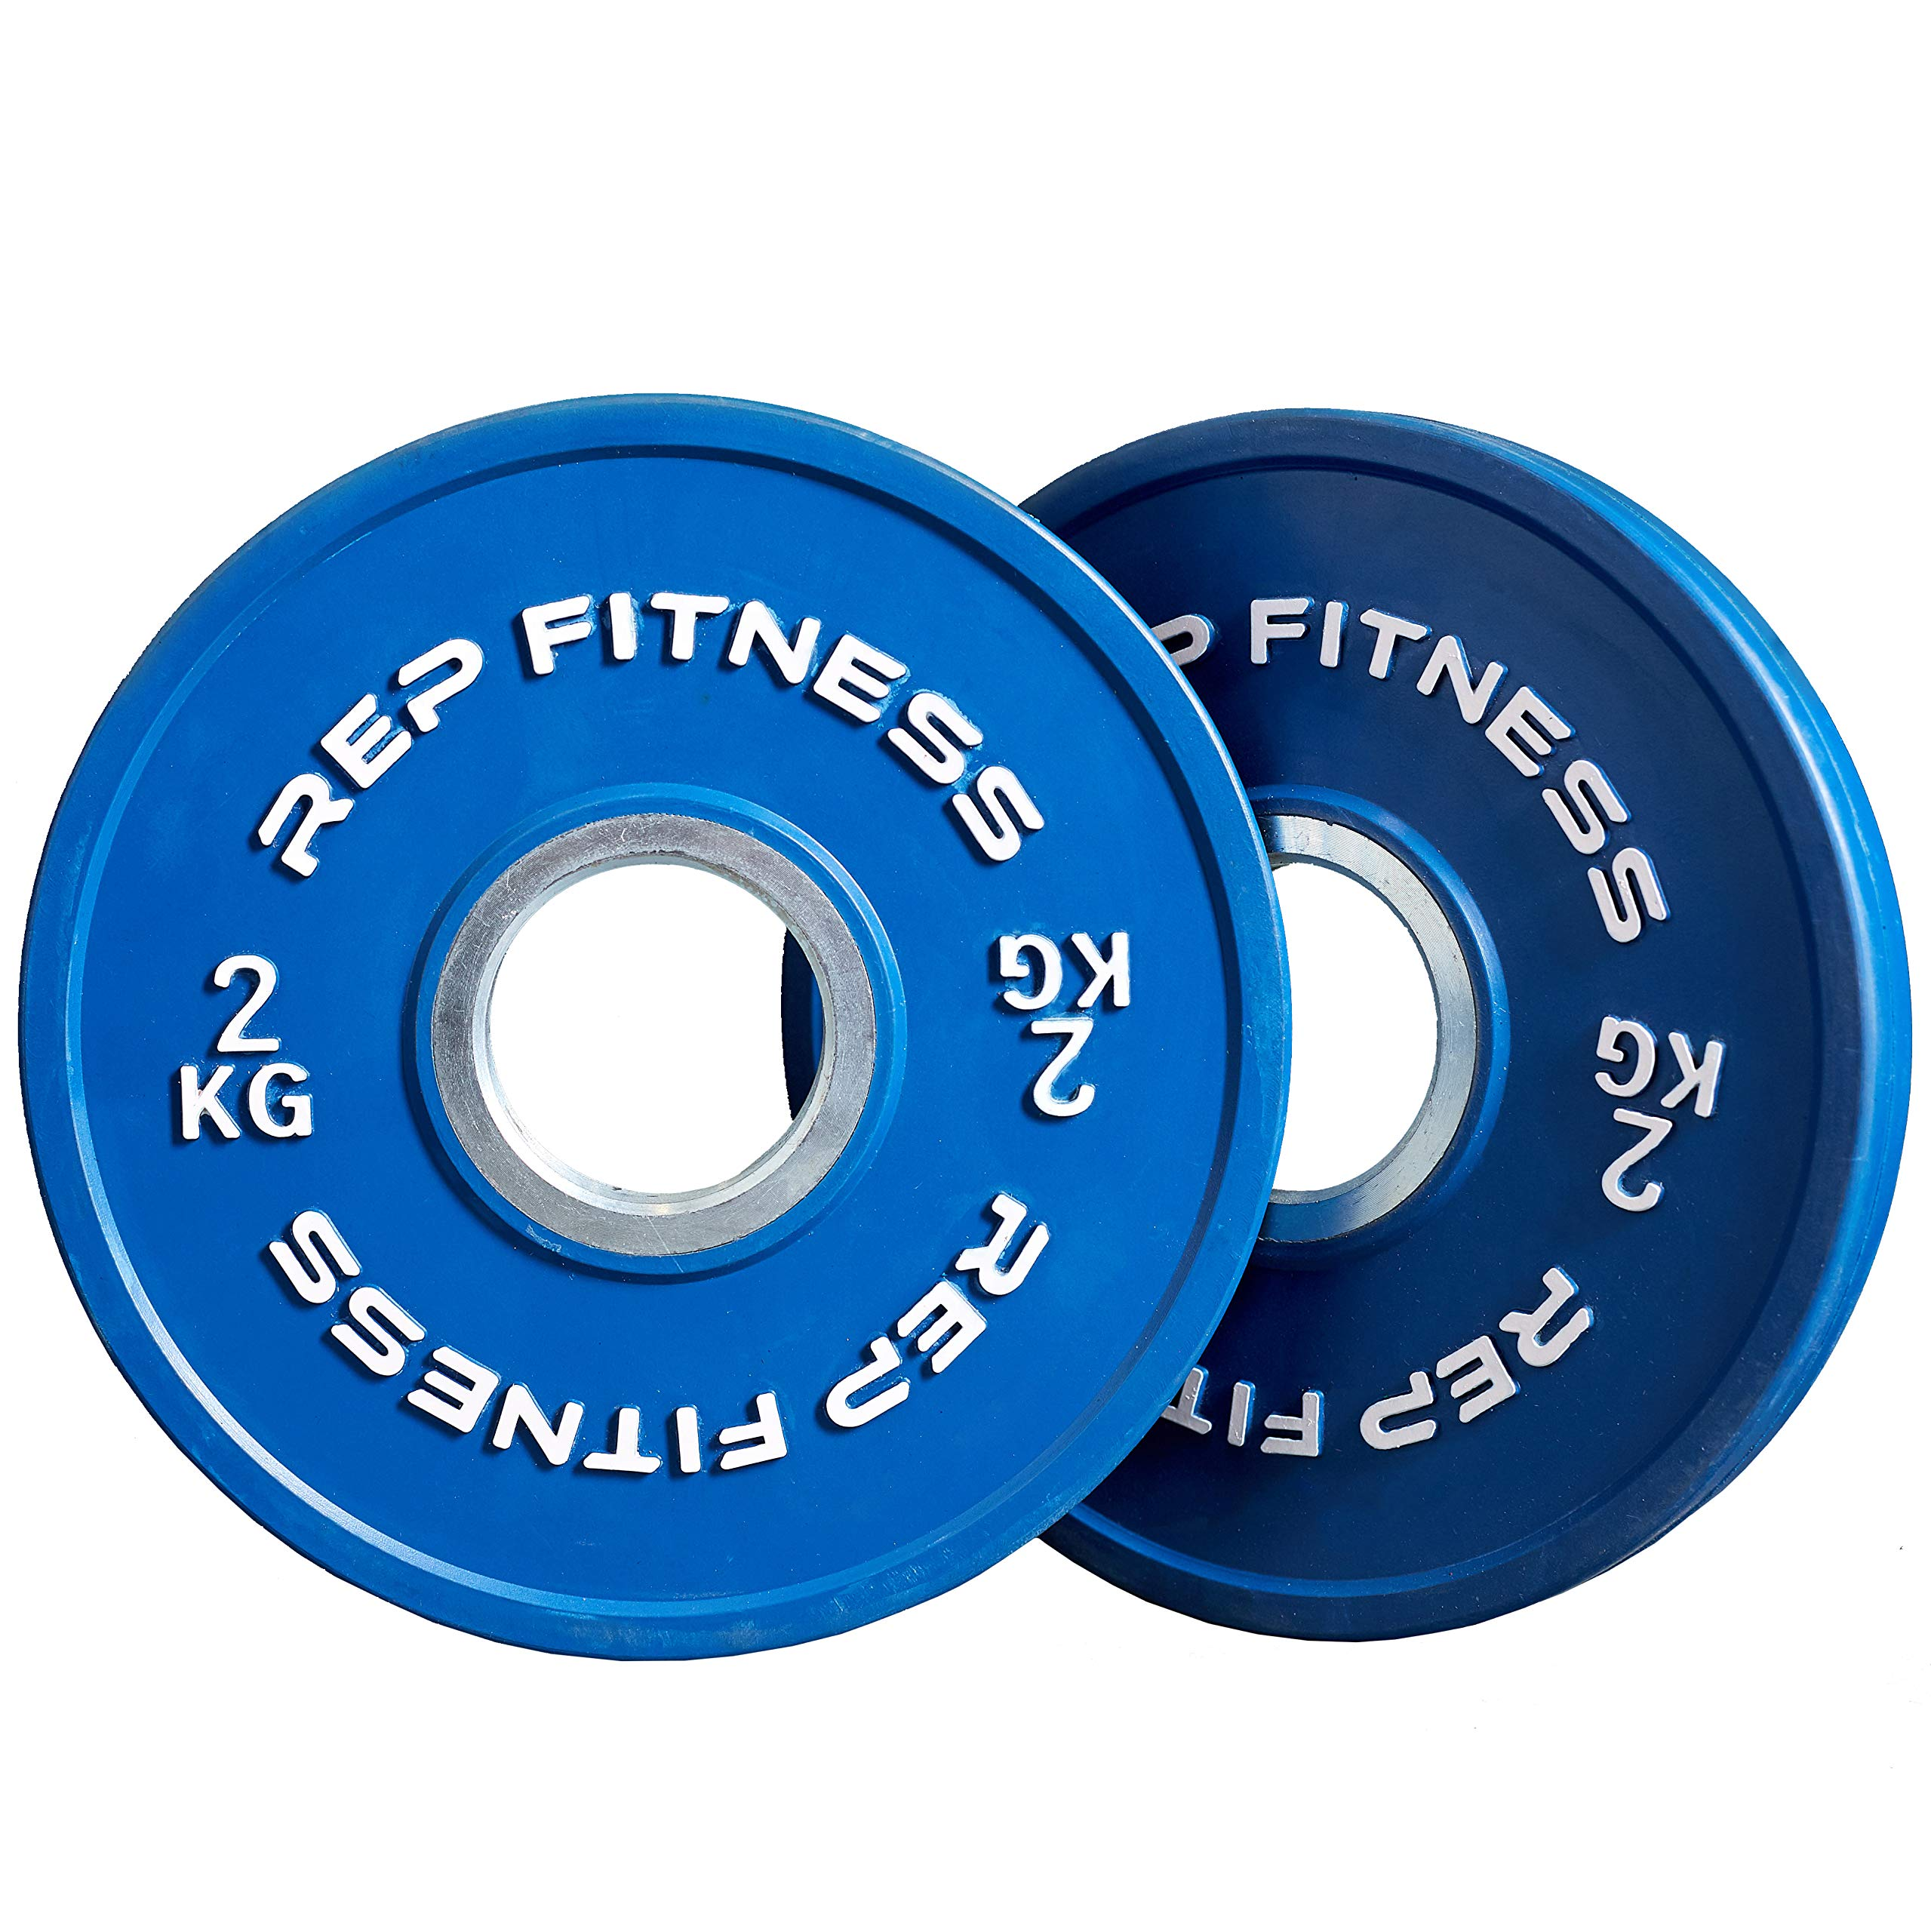 Rep Change Plates - 2.0 kg